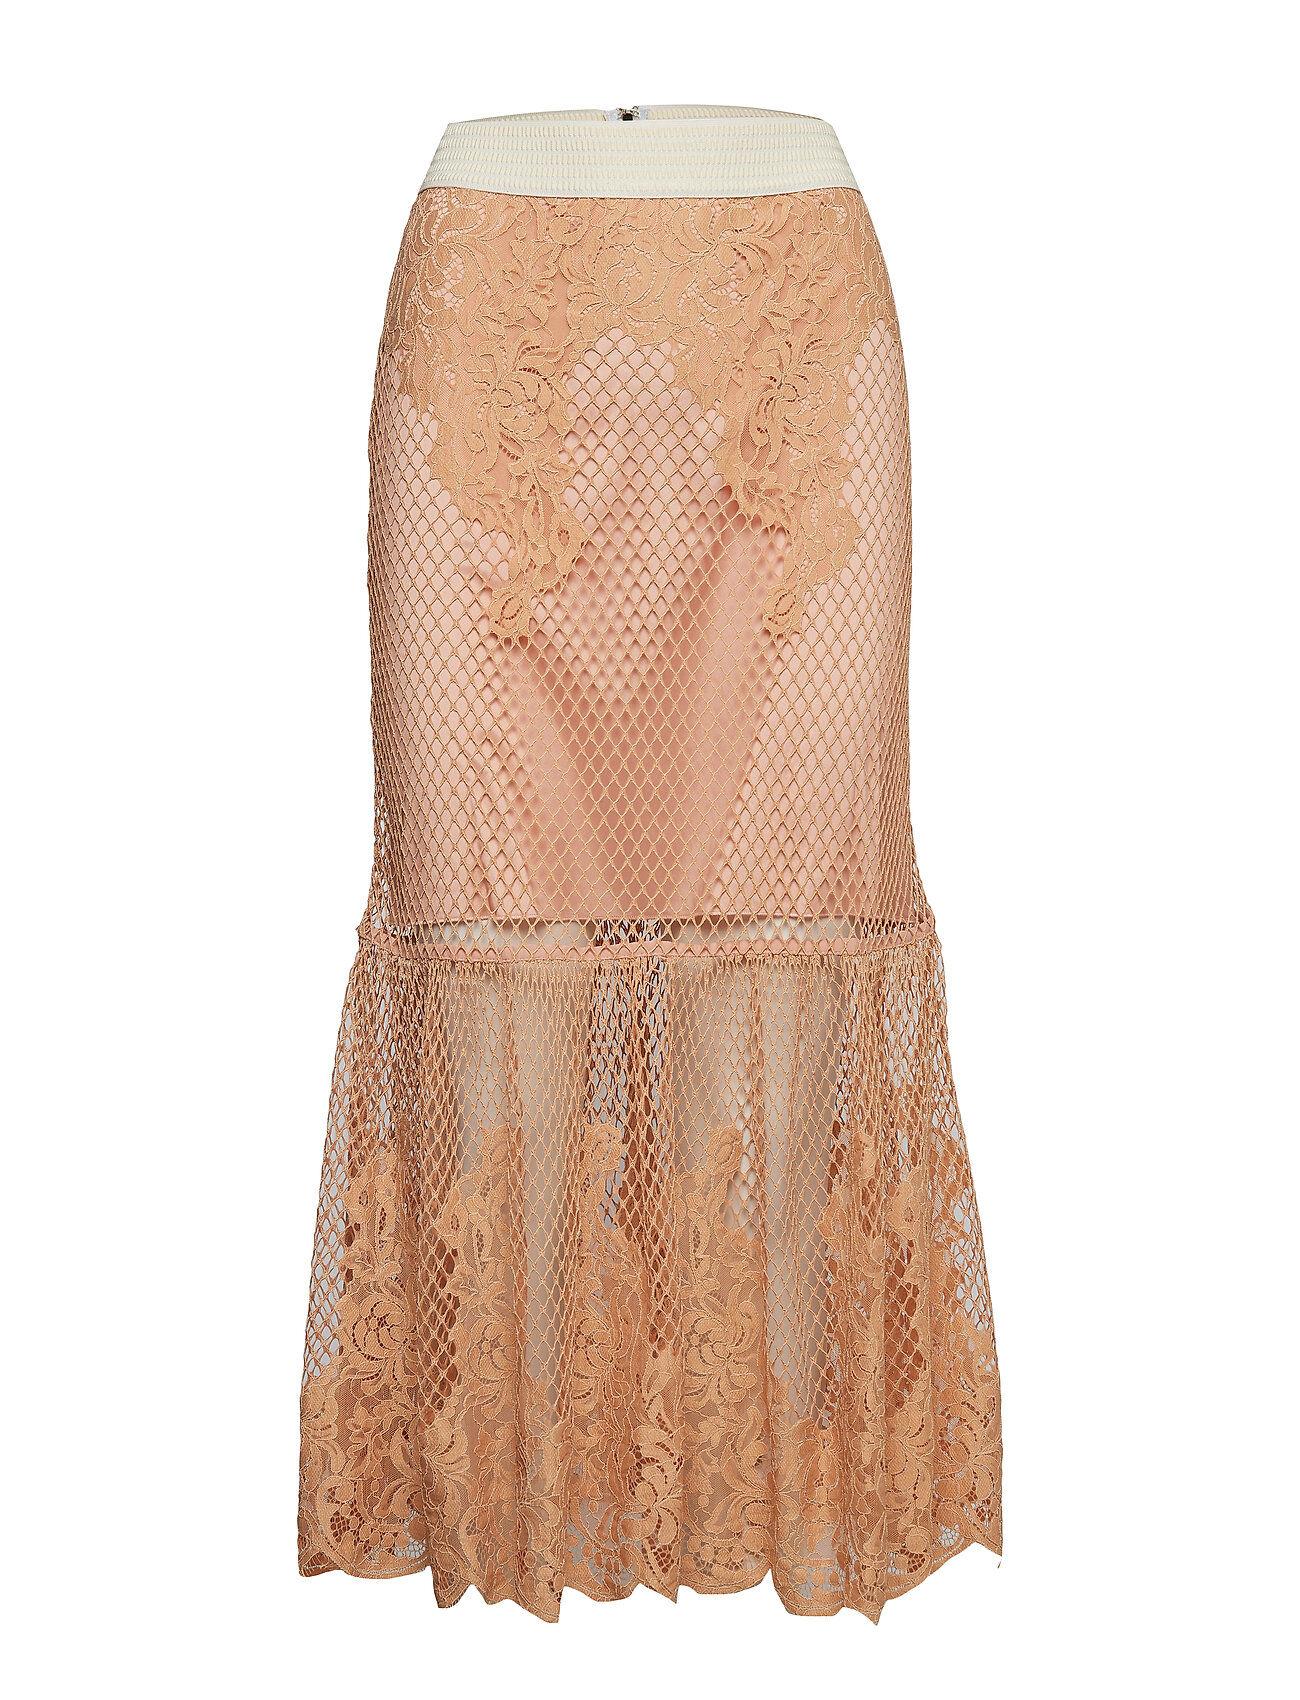 Valerie Jessa Skirt